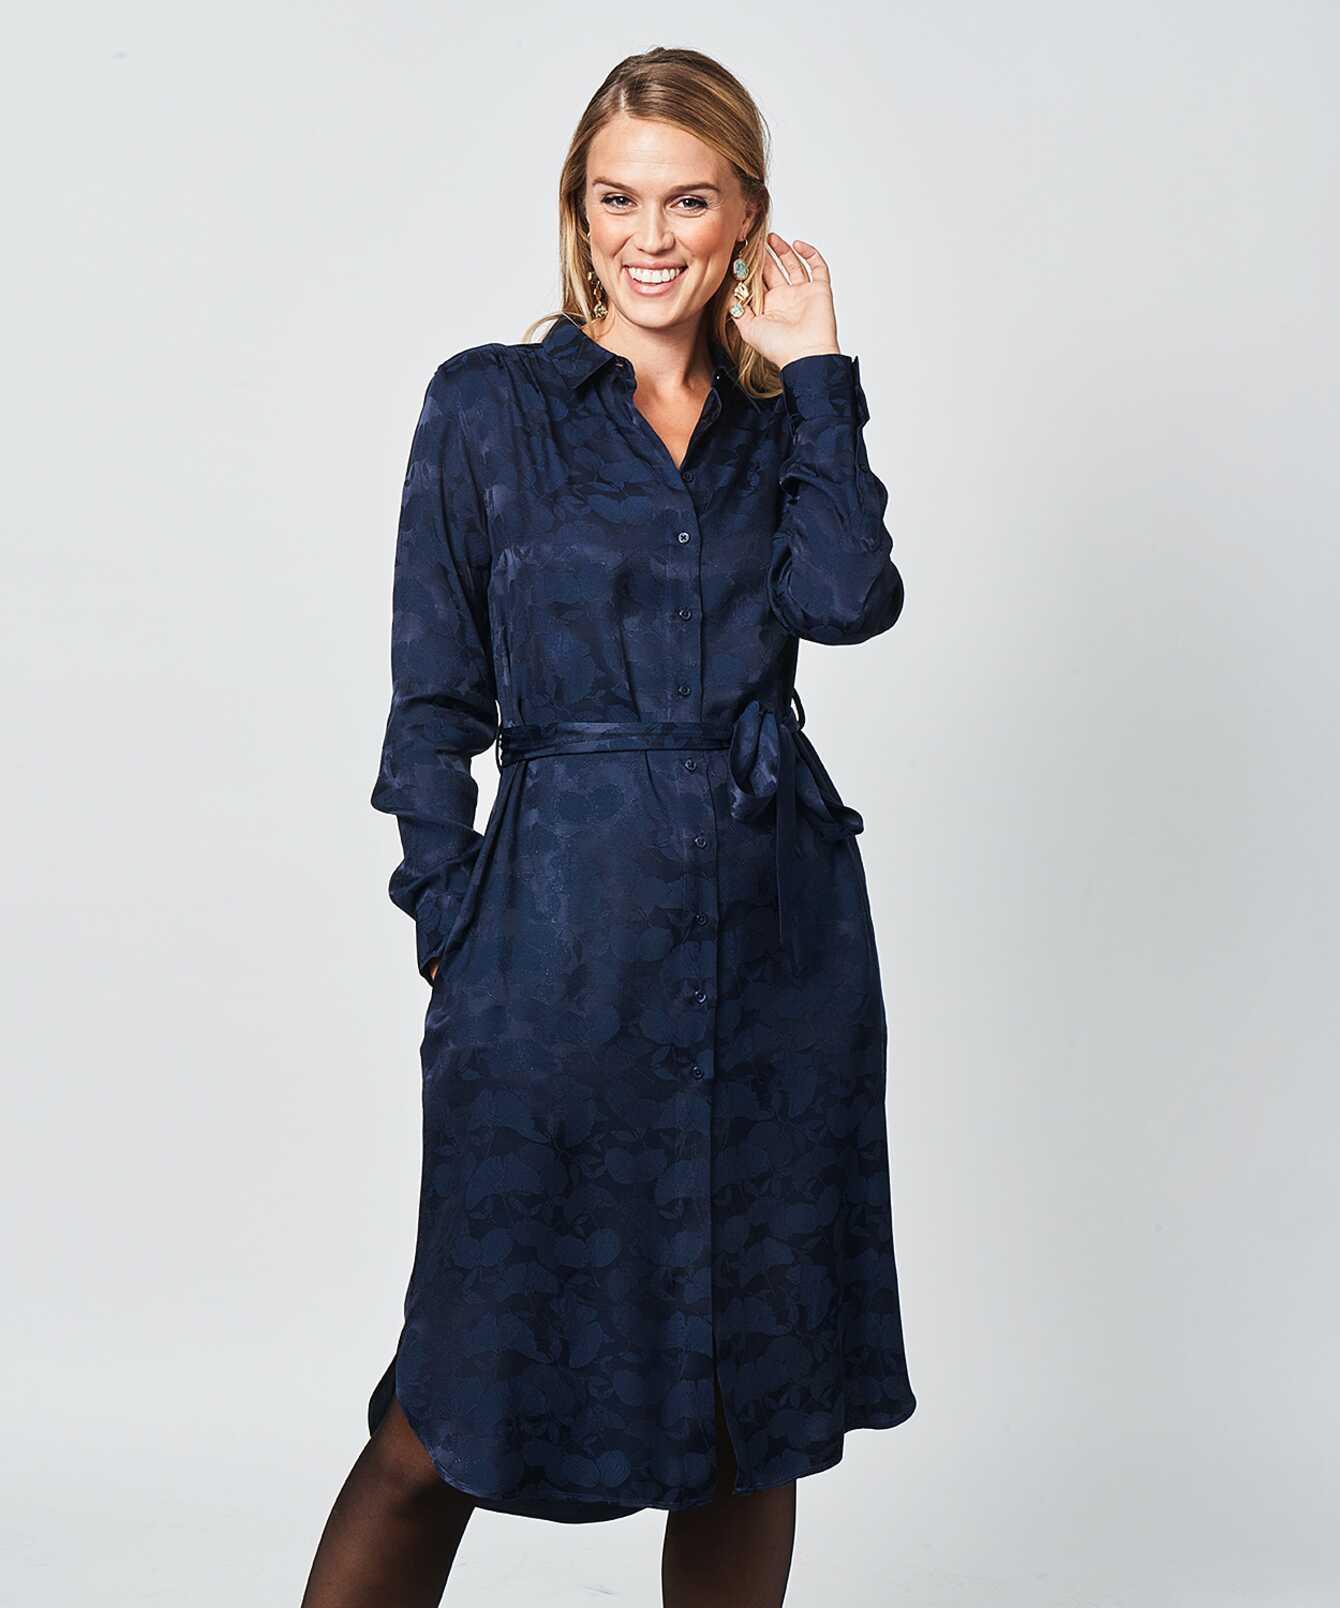 Skjorta Ida Jacquard The Shirt Factory